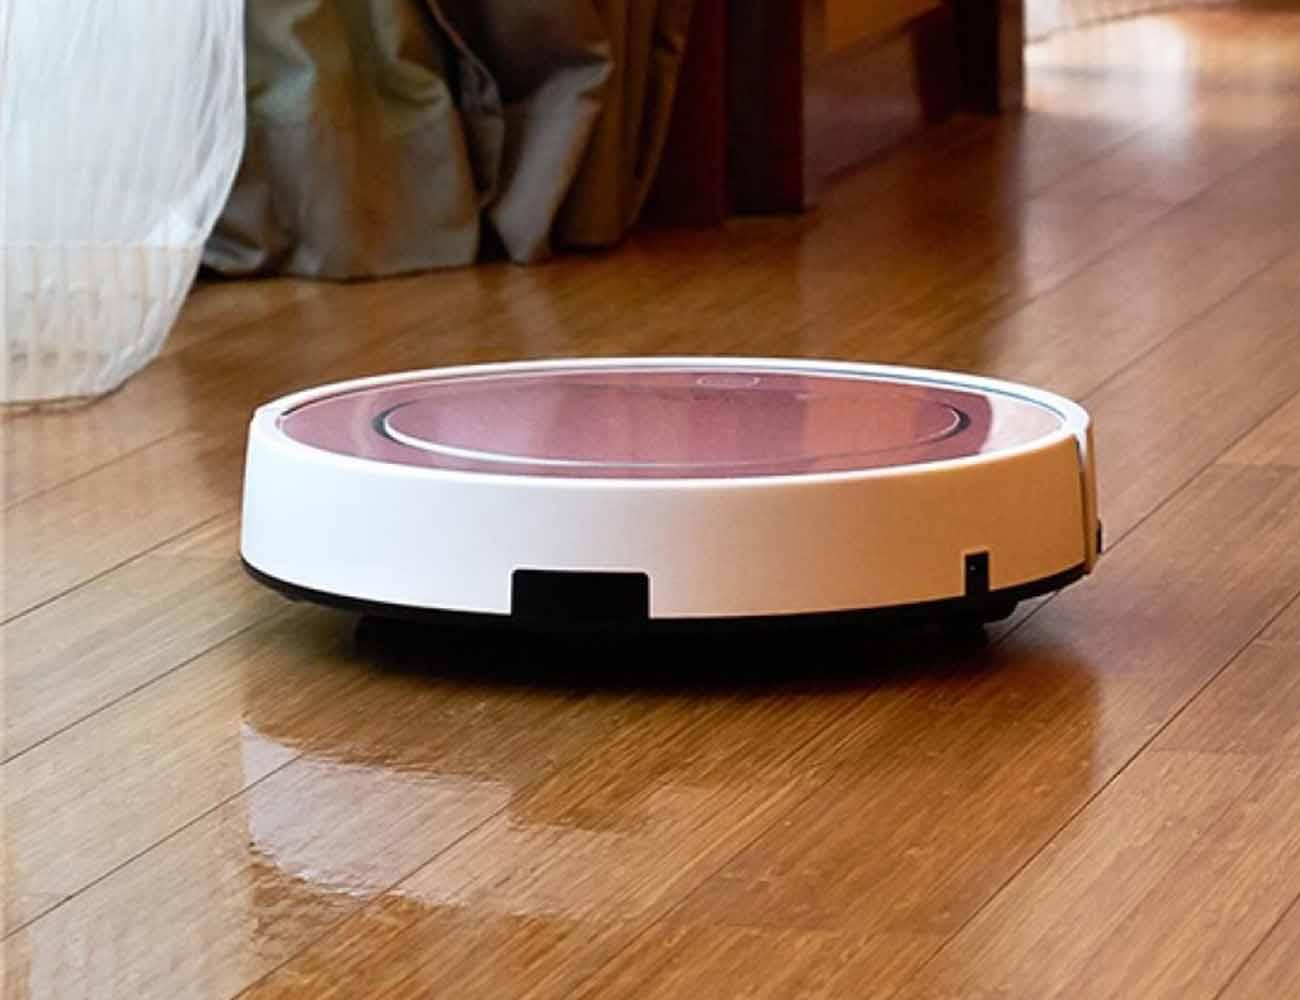 ILIFE V7S Smart Robotic Vacuum Cleaner – Rose Gold